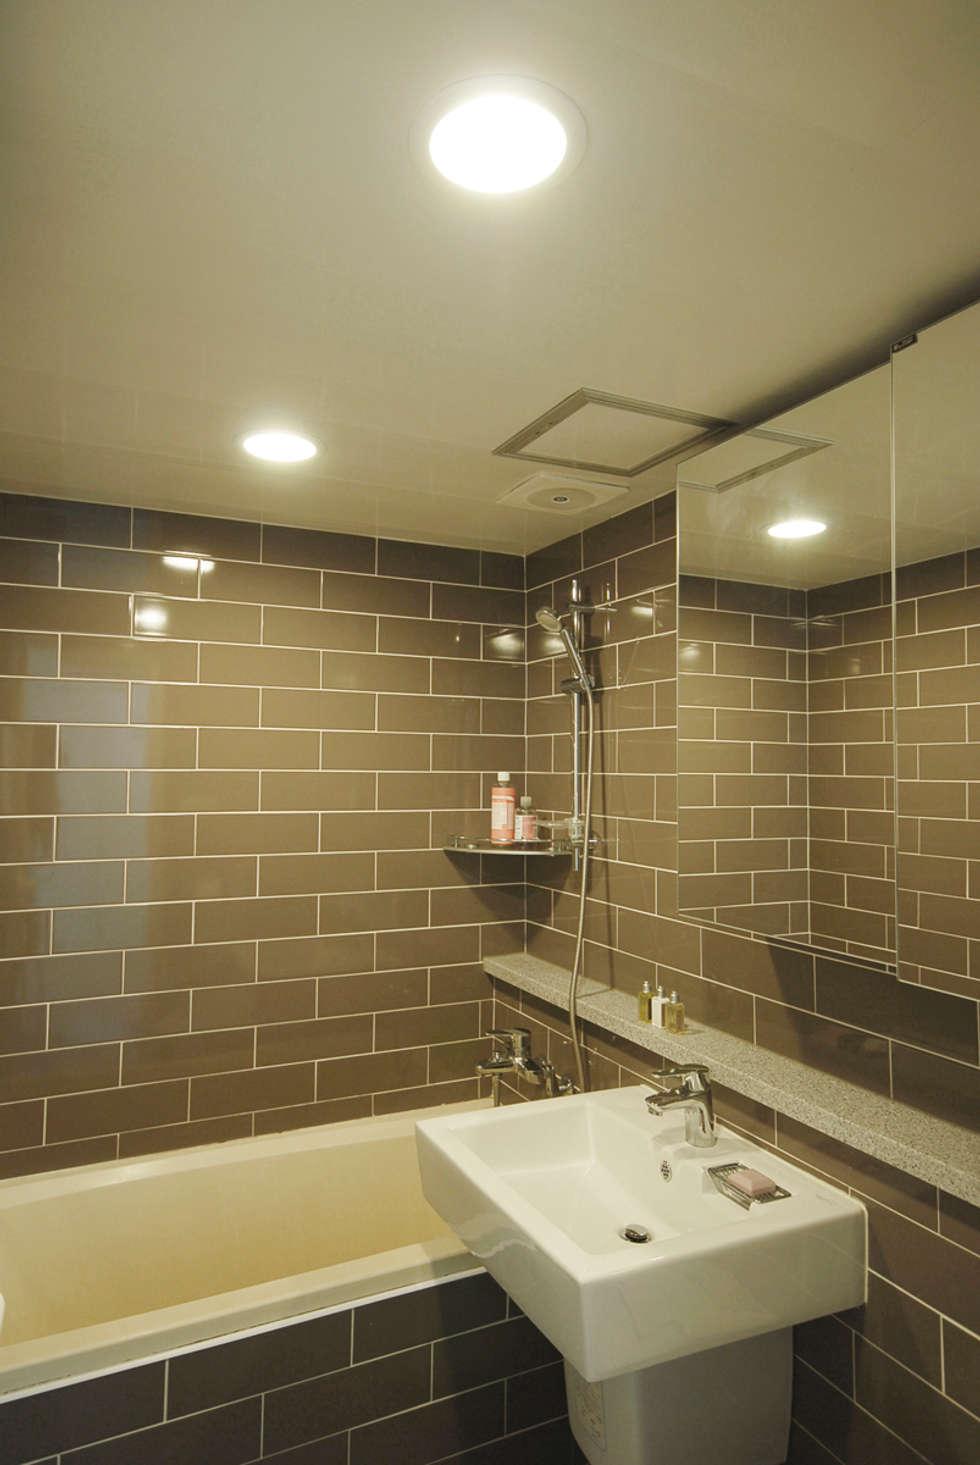 C Apartment (63sqm.): By Seog Be Seog   바이석비석의  화장실